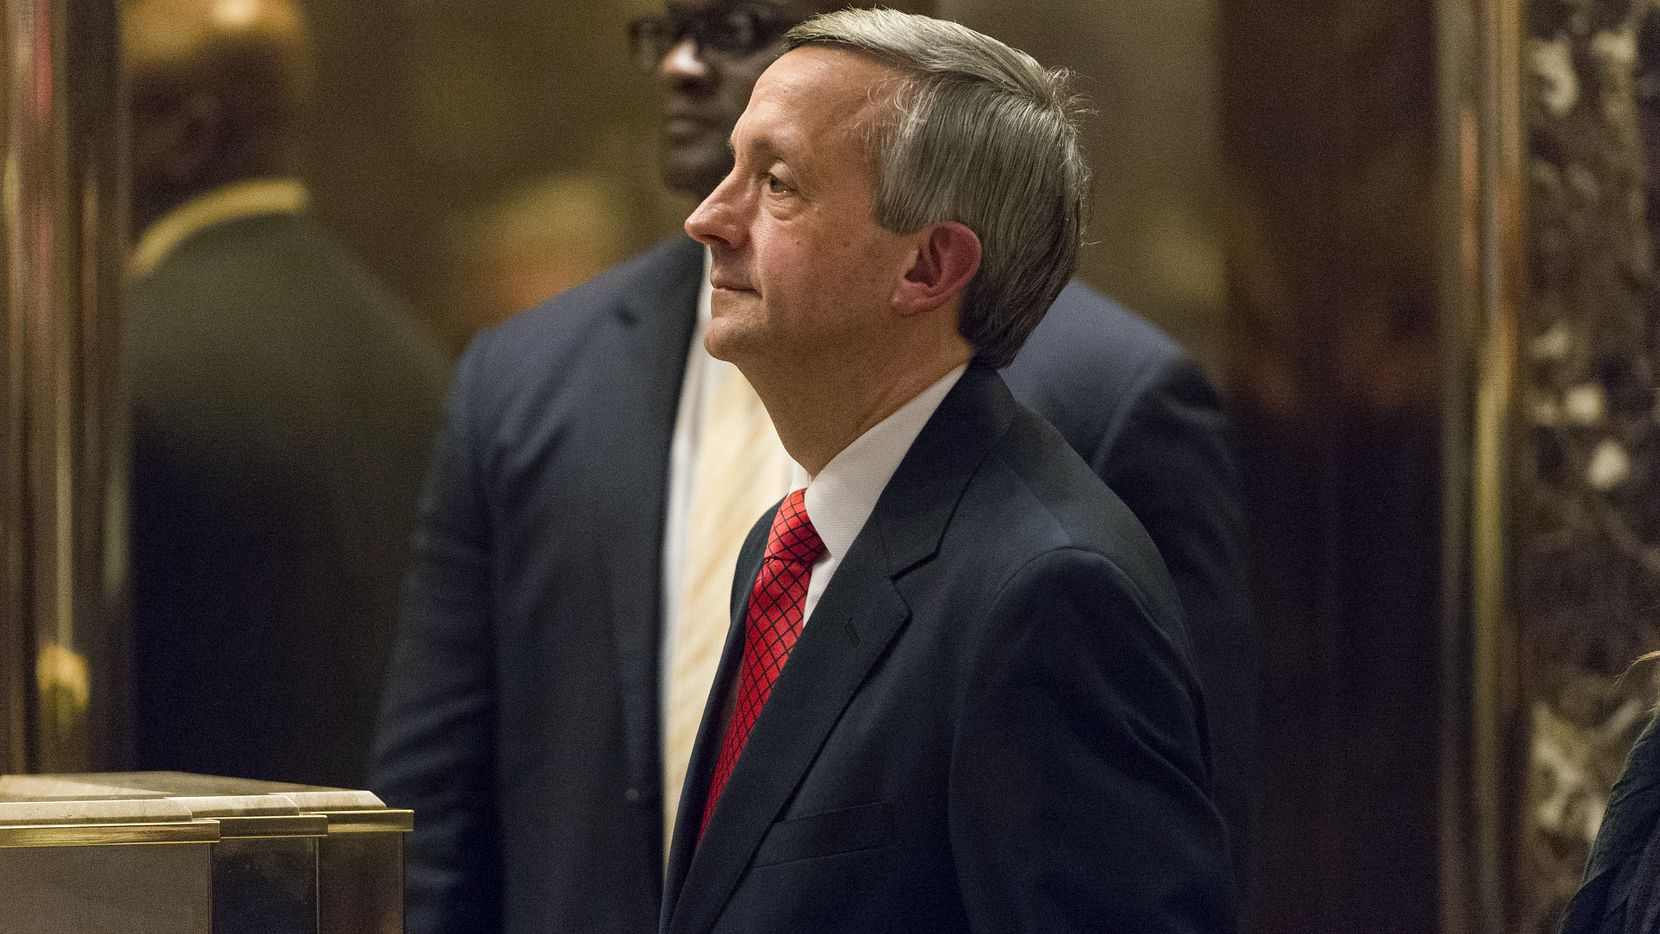 Pastor Robert Jeffress arrives in the lobby of Trump Tower on Jan. 3. (Albin Lohr-Jones/Bloomberg News)